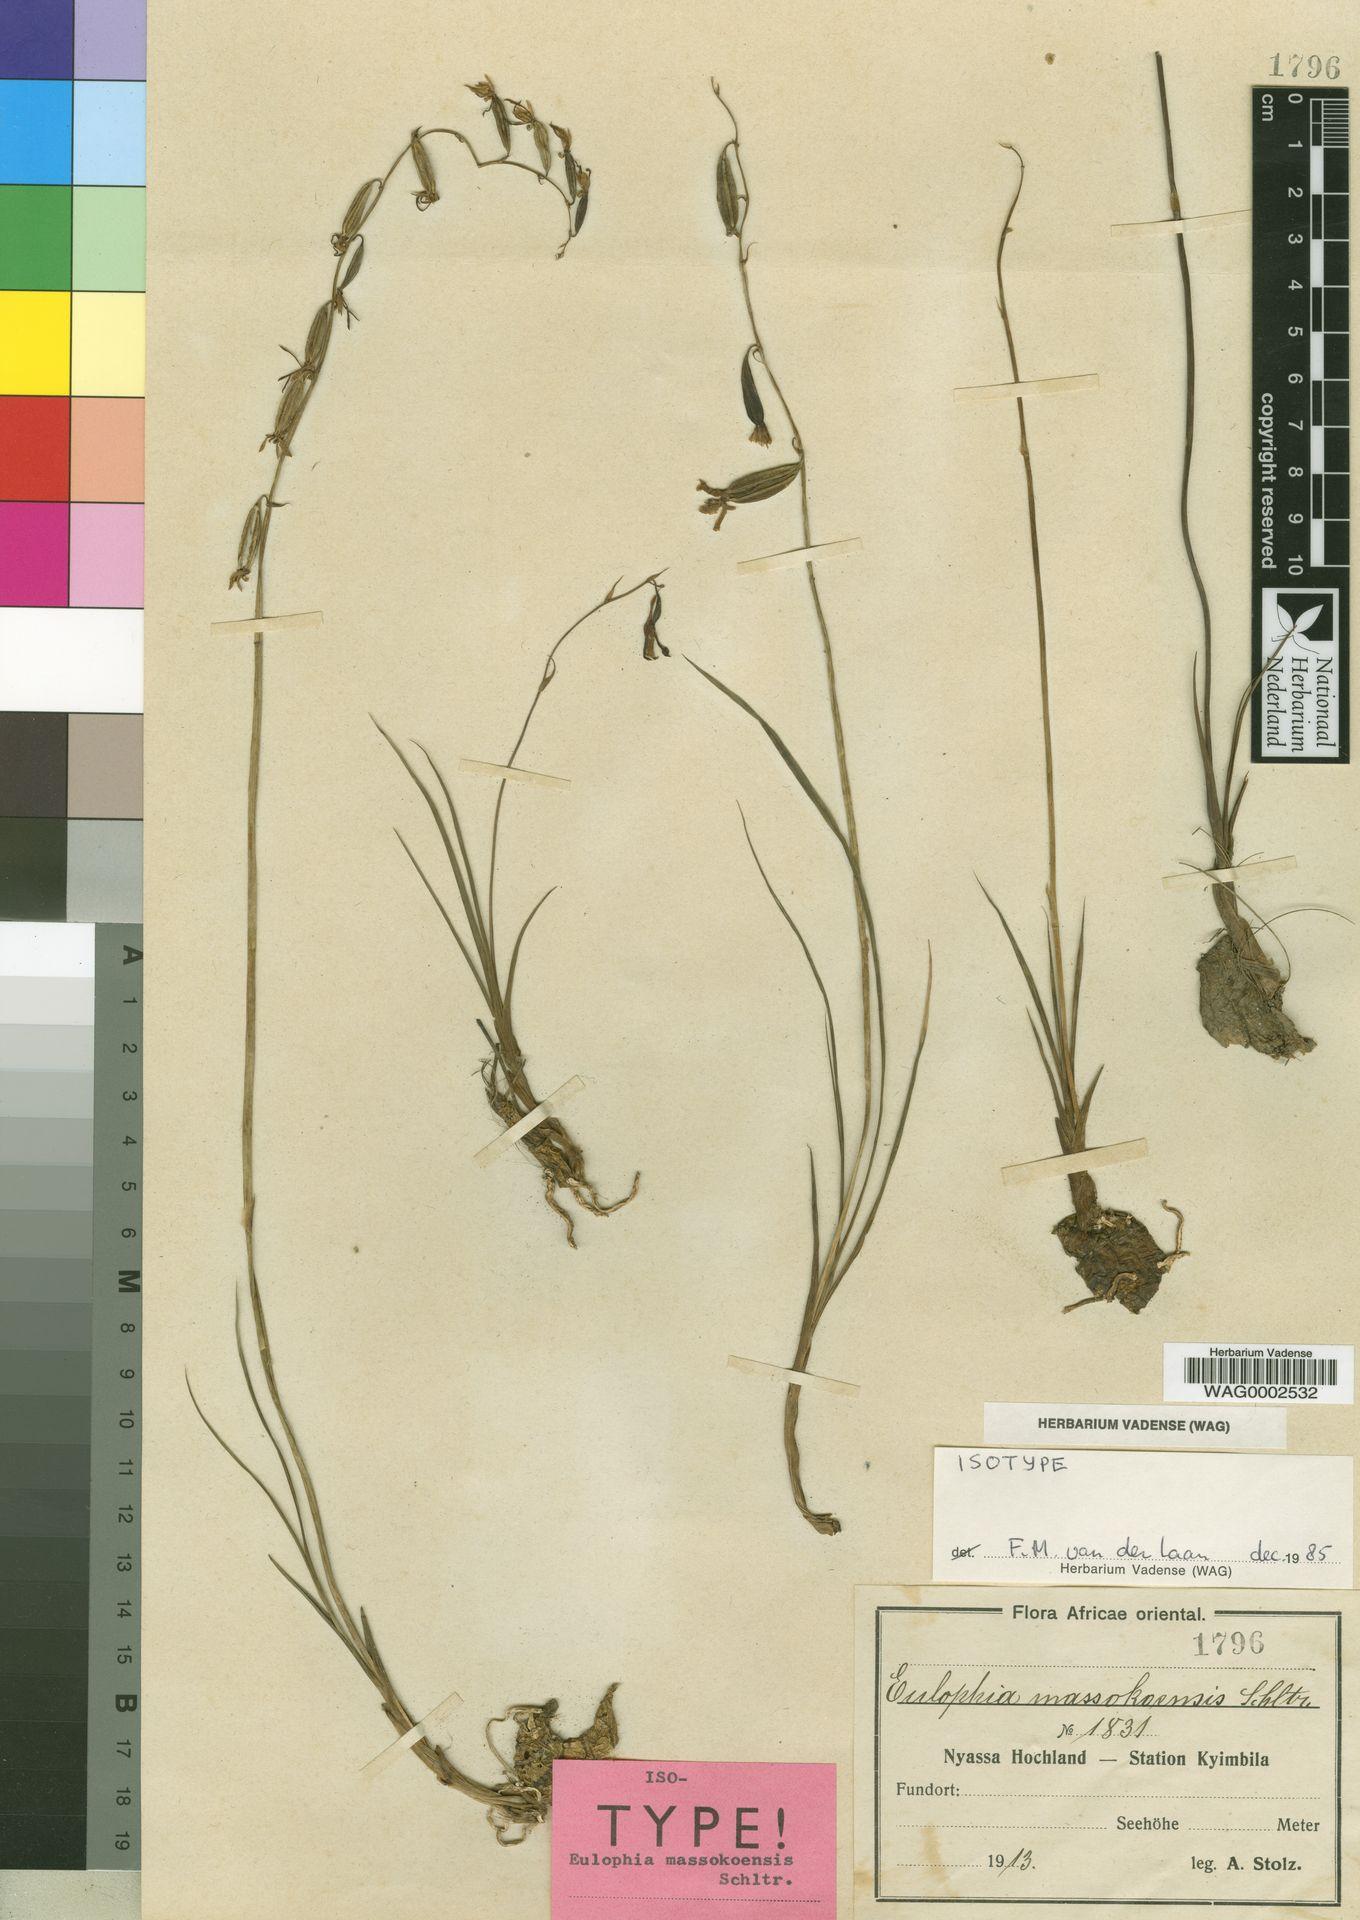 WAG0002532 | Eulophia massokoensis Schltr.